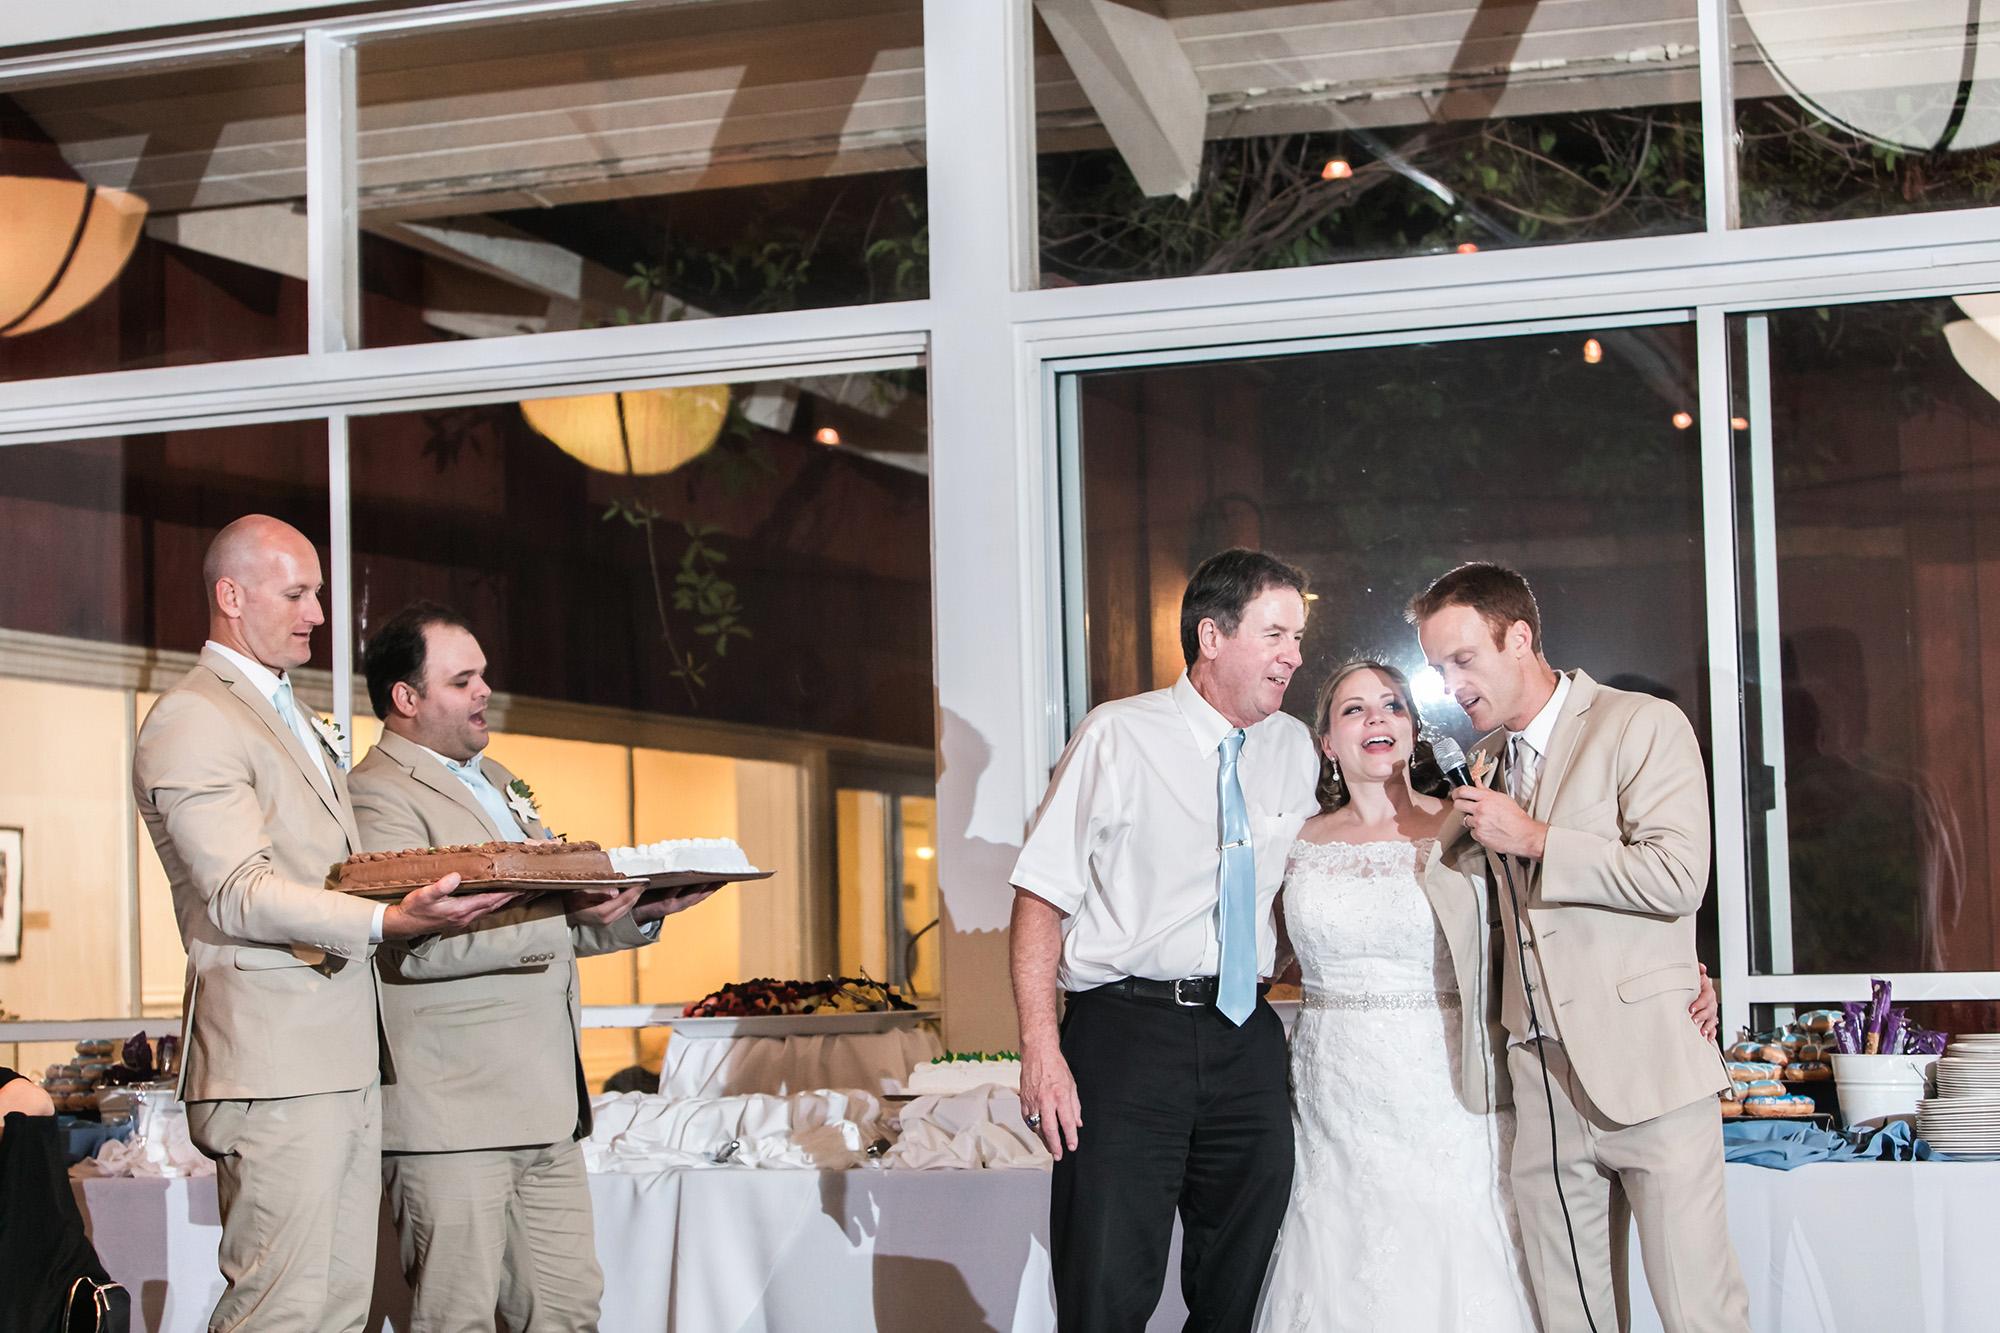 unforgettable-st-monica-wedding-carrie-vines-photography-118.jpg